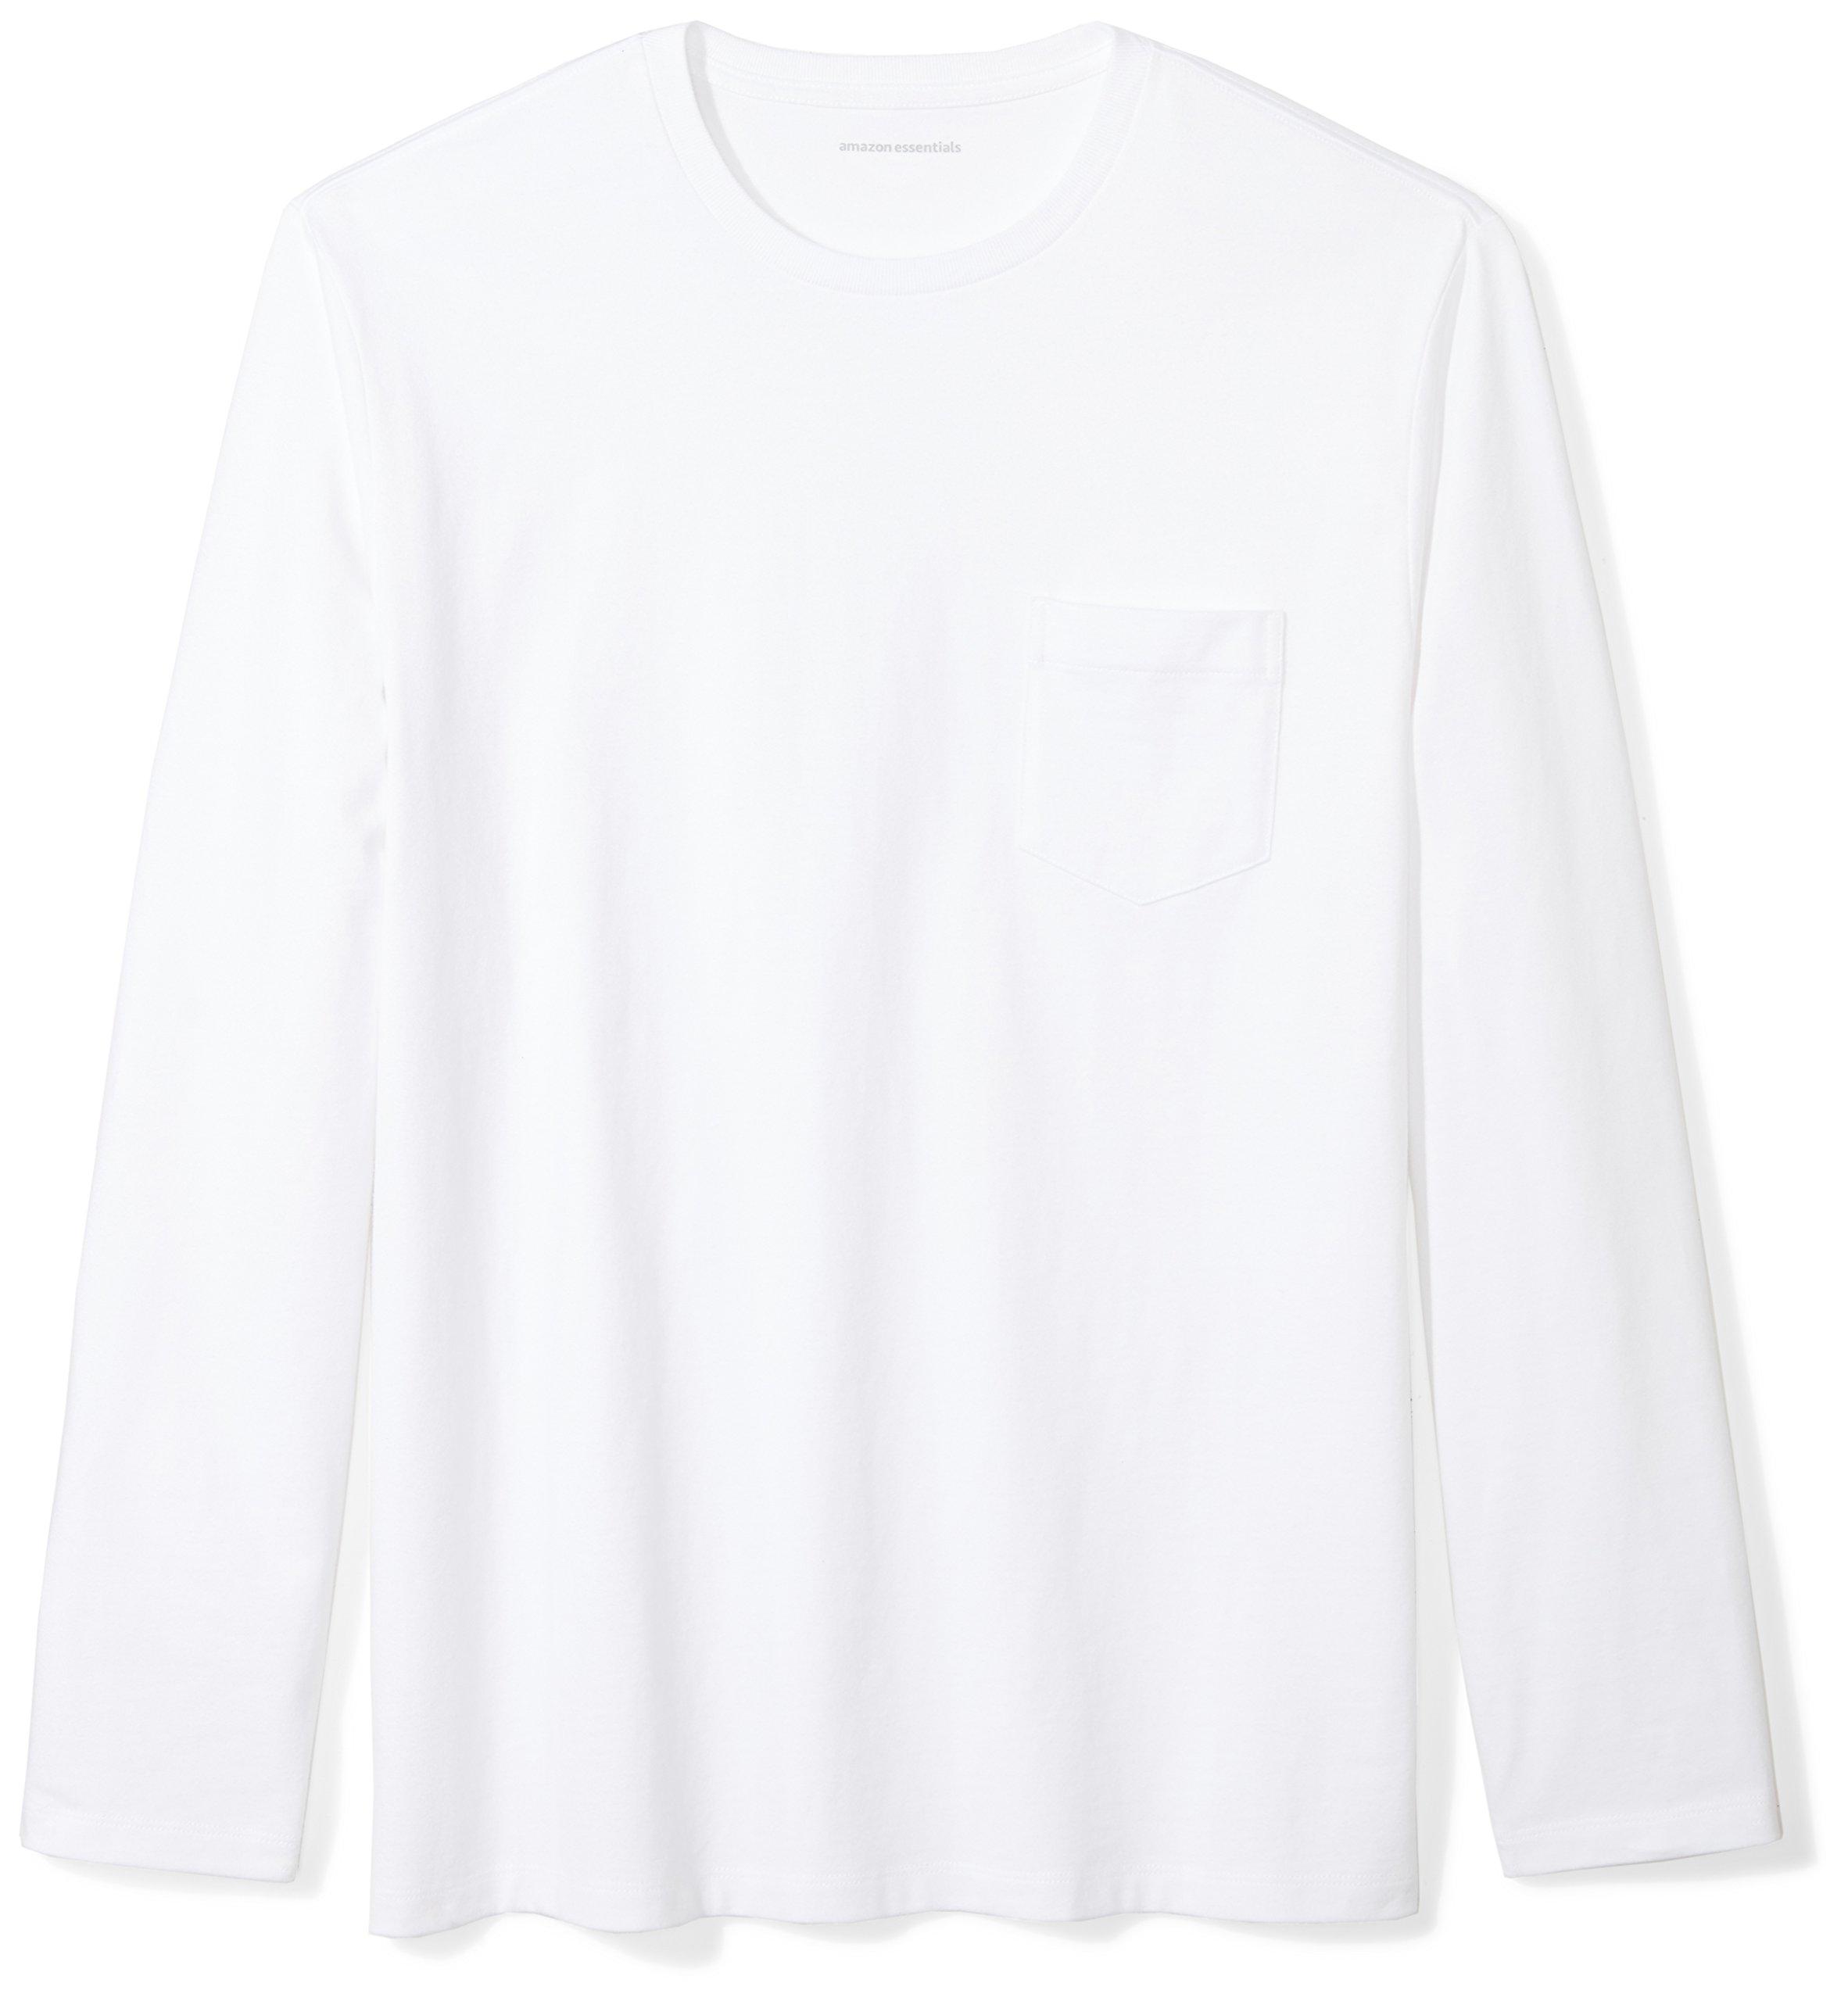 Amazon Essentials Men's Regular-Fit Long-Sleeve Pocket T-Shirt, White, Medium